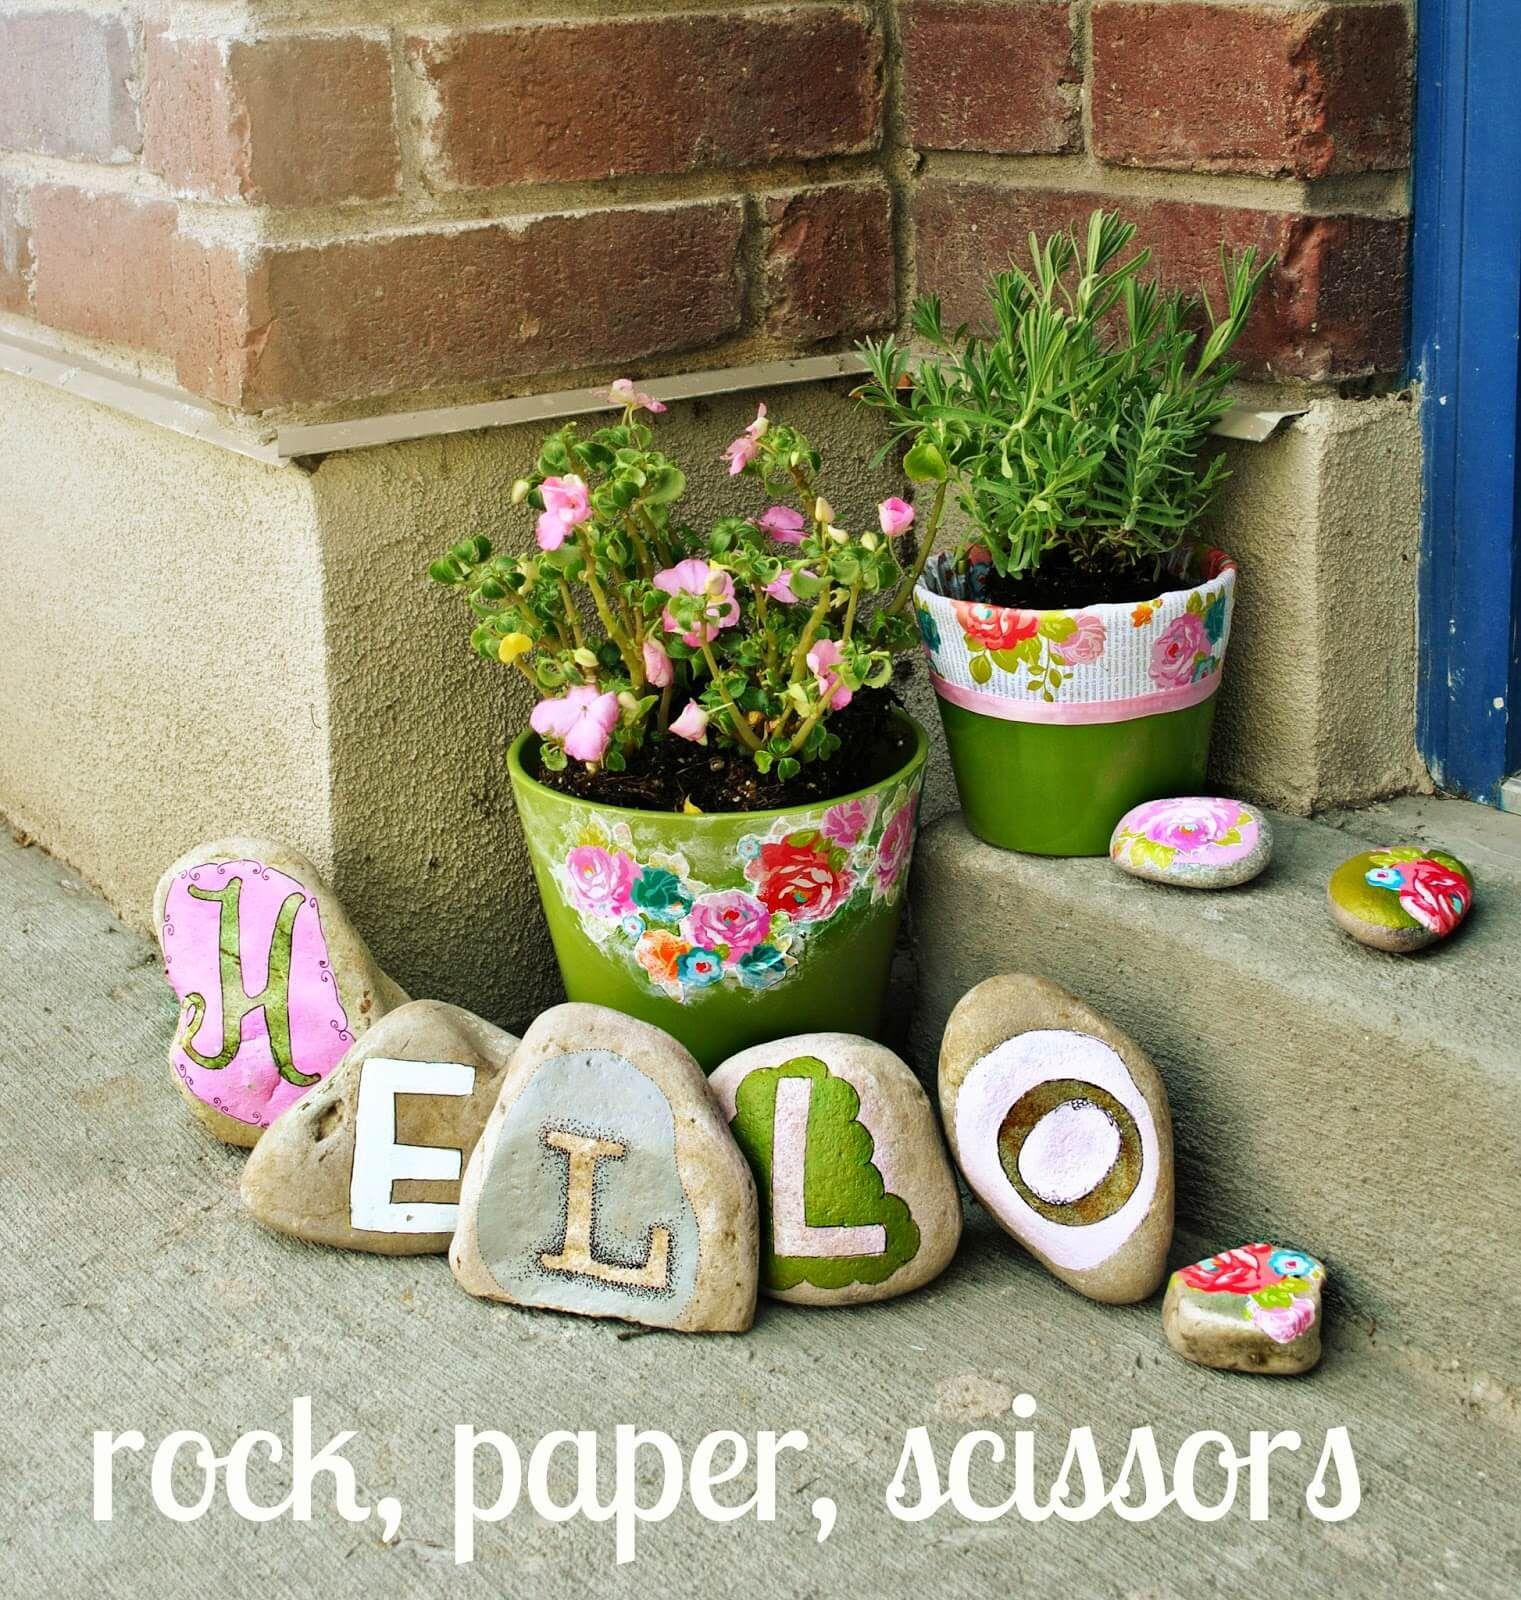 Diy garden decorations - 23 Fun Diy Garden Projects With Rocks